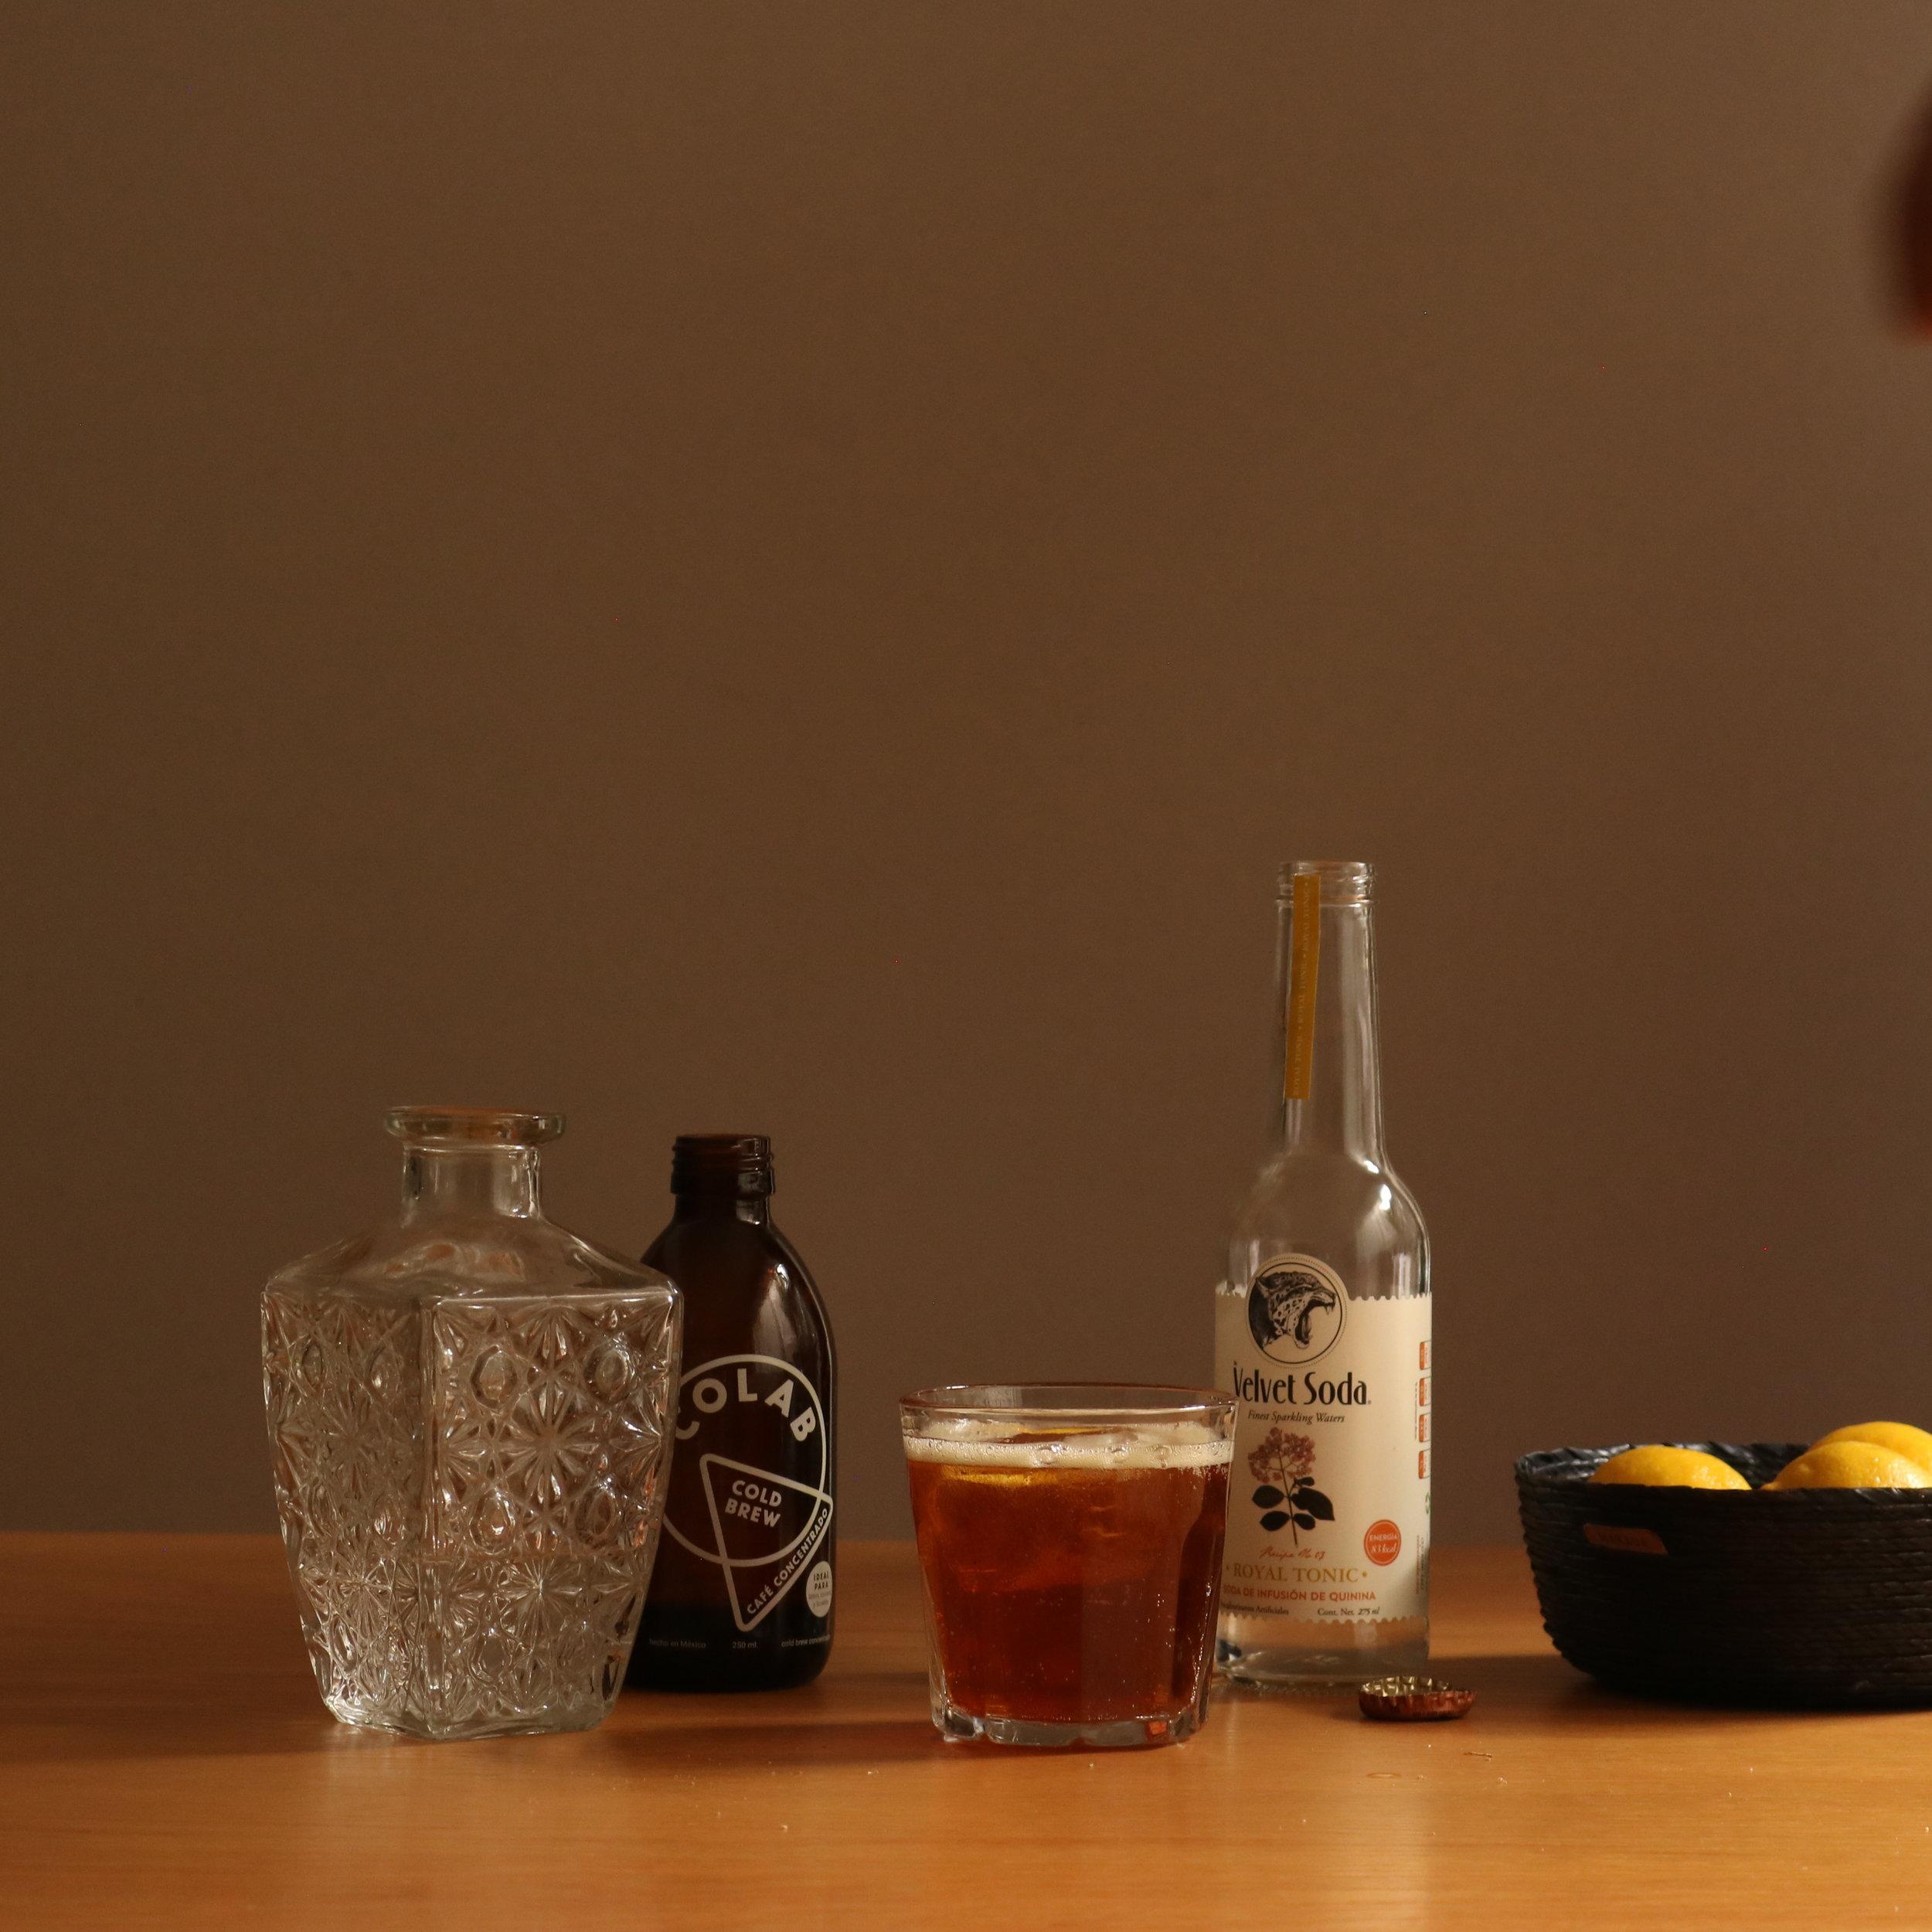 colab cold brew turbo gin & tonic, cold brew cocktail recipe, receta